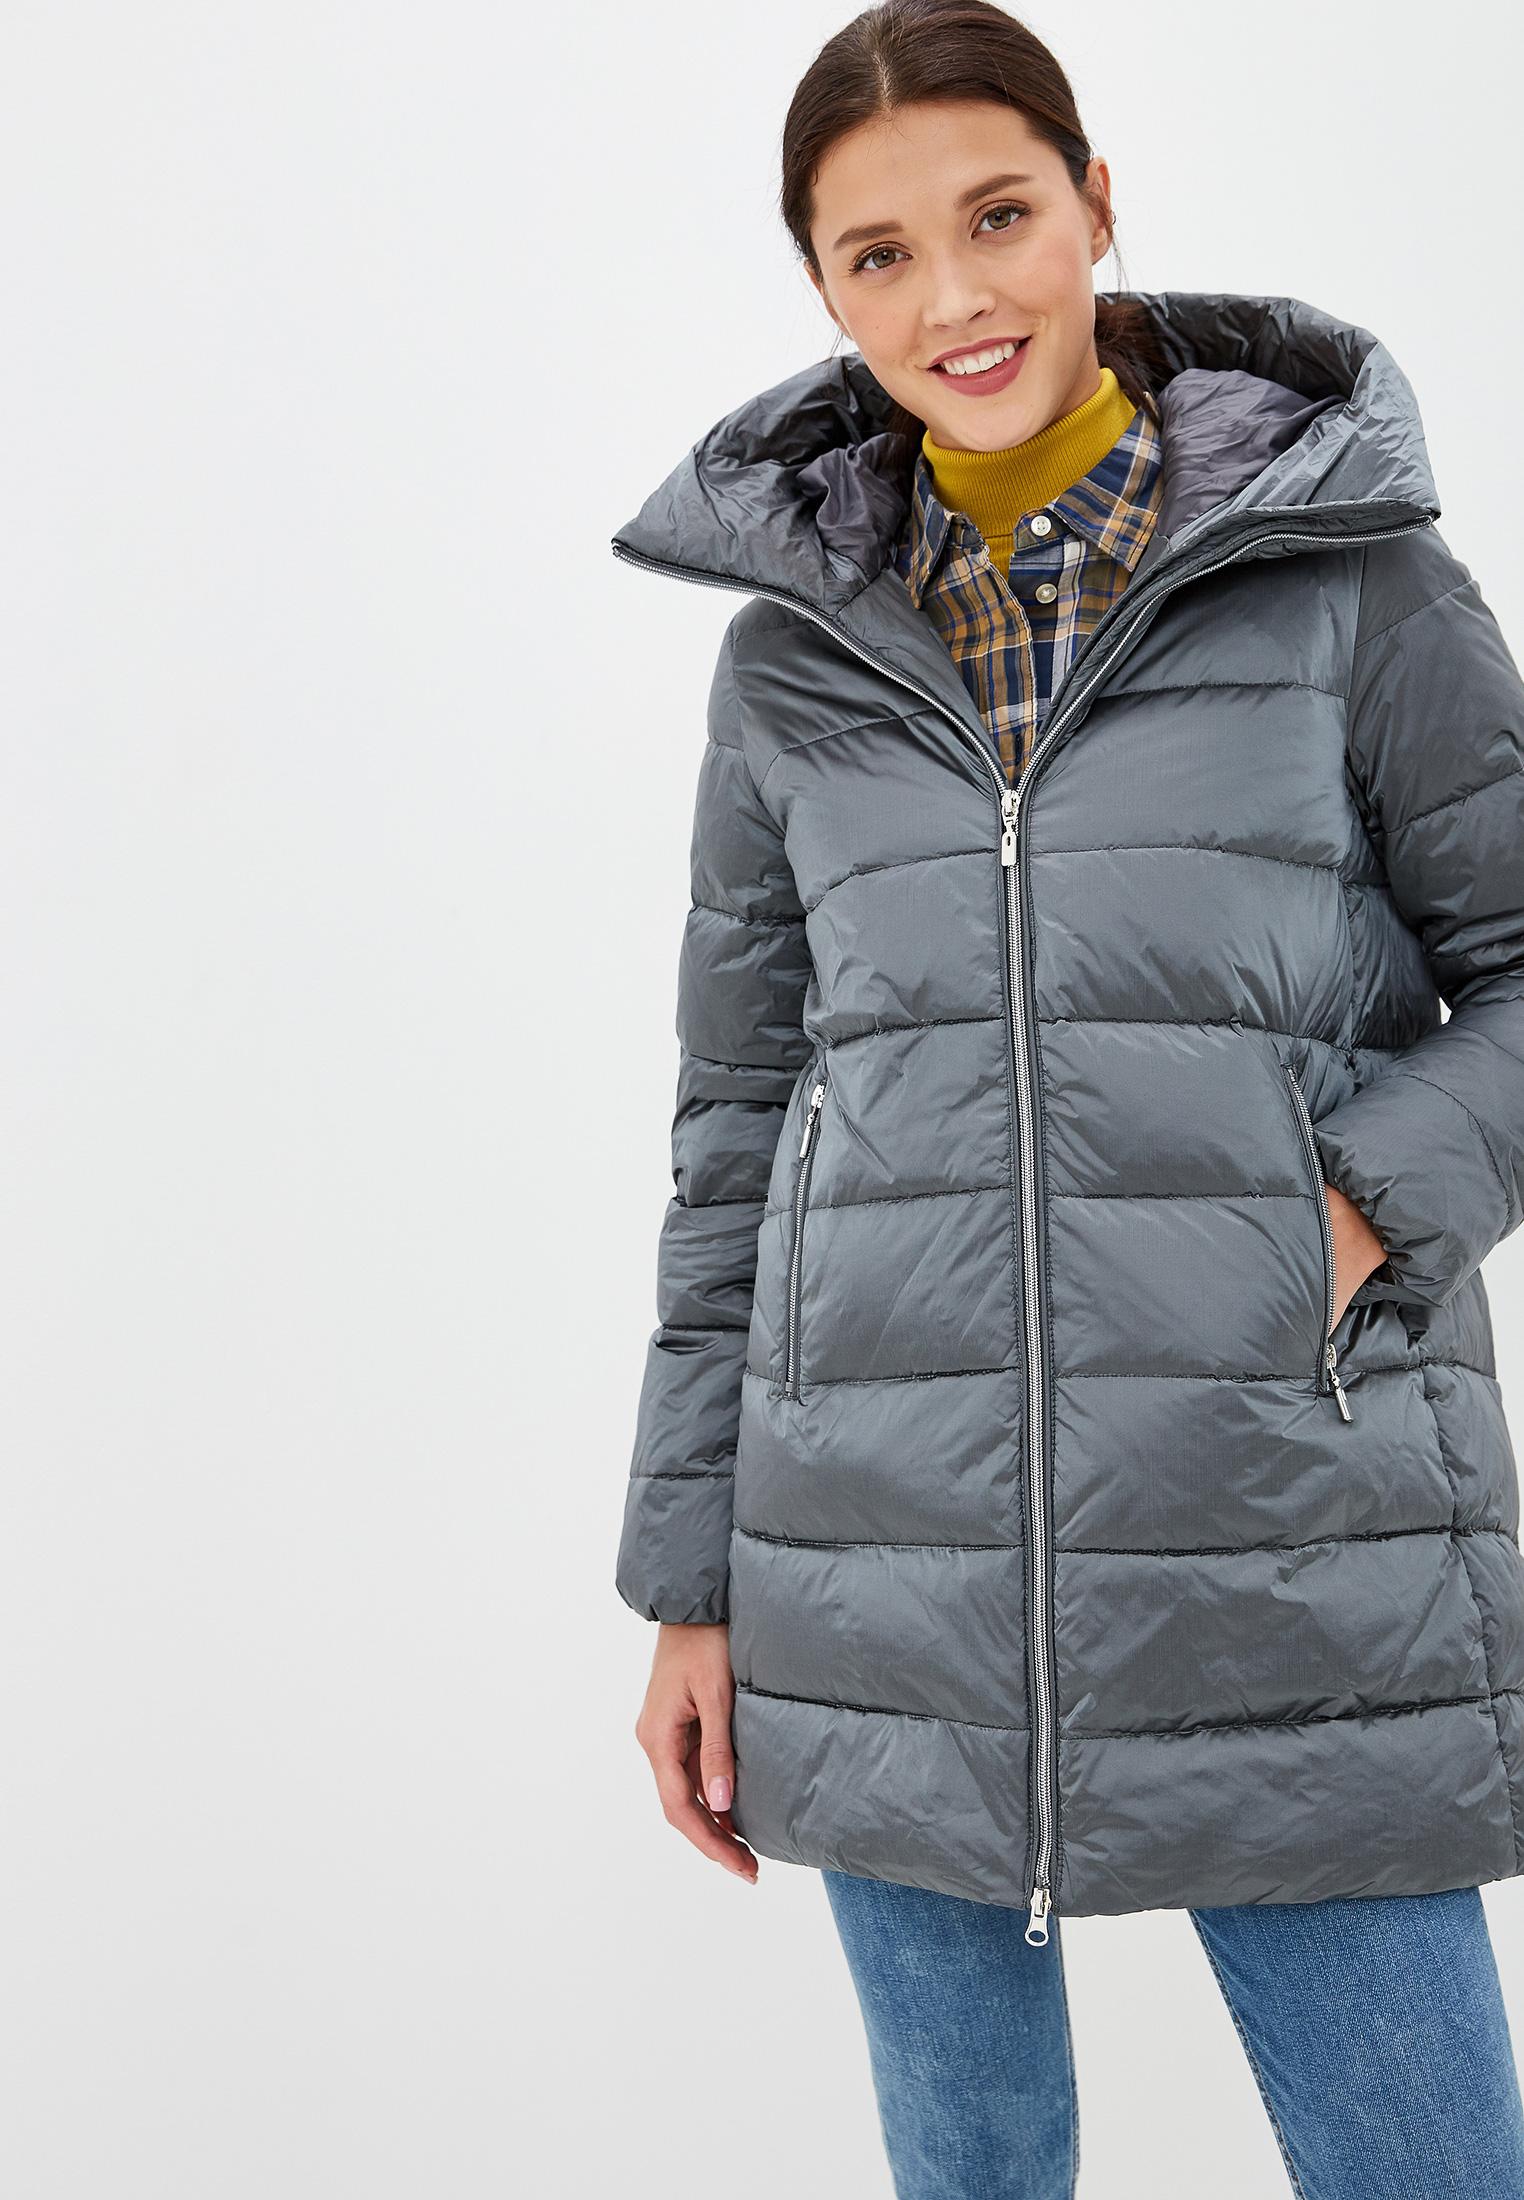 Пуховик, Savage, цвет: серый. Артикул: SA004EWGESA3. Одежда / Верхняя одежда / Пуховики и зимние куртки